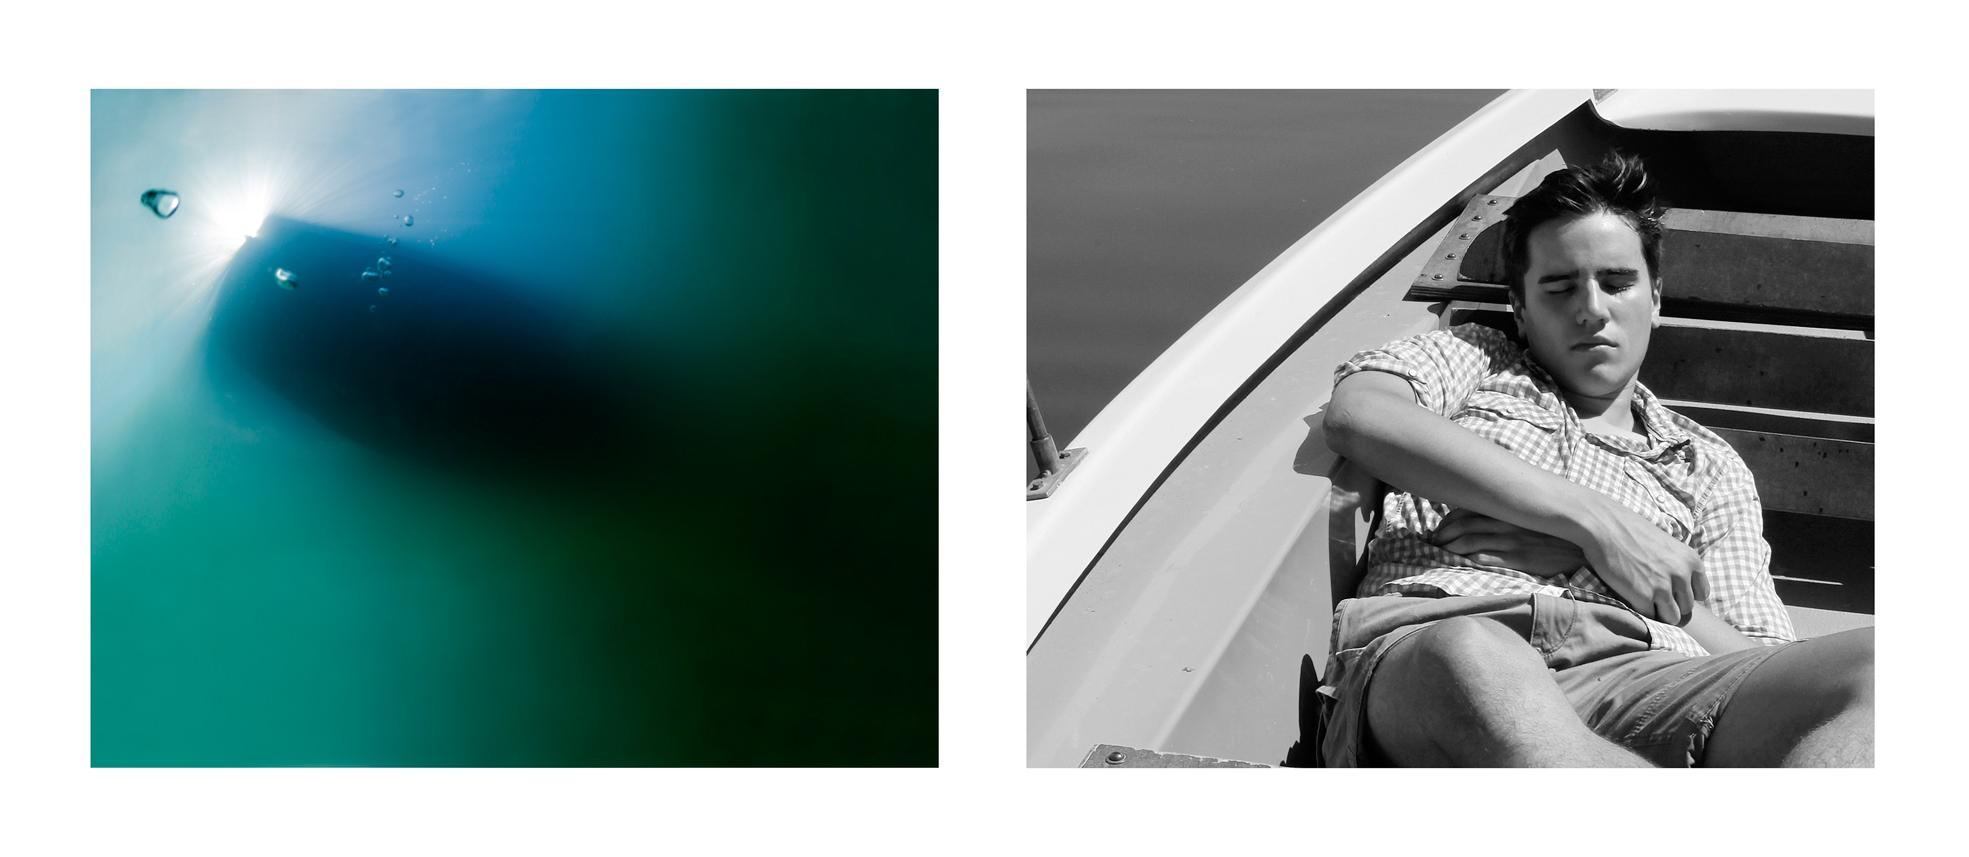 » Exposure #117.01: Starnberger See, 47°54'24.4″N 11°19'05.7″E, 06.30.15, 2:33 p.m.